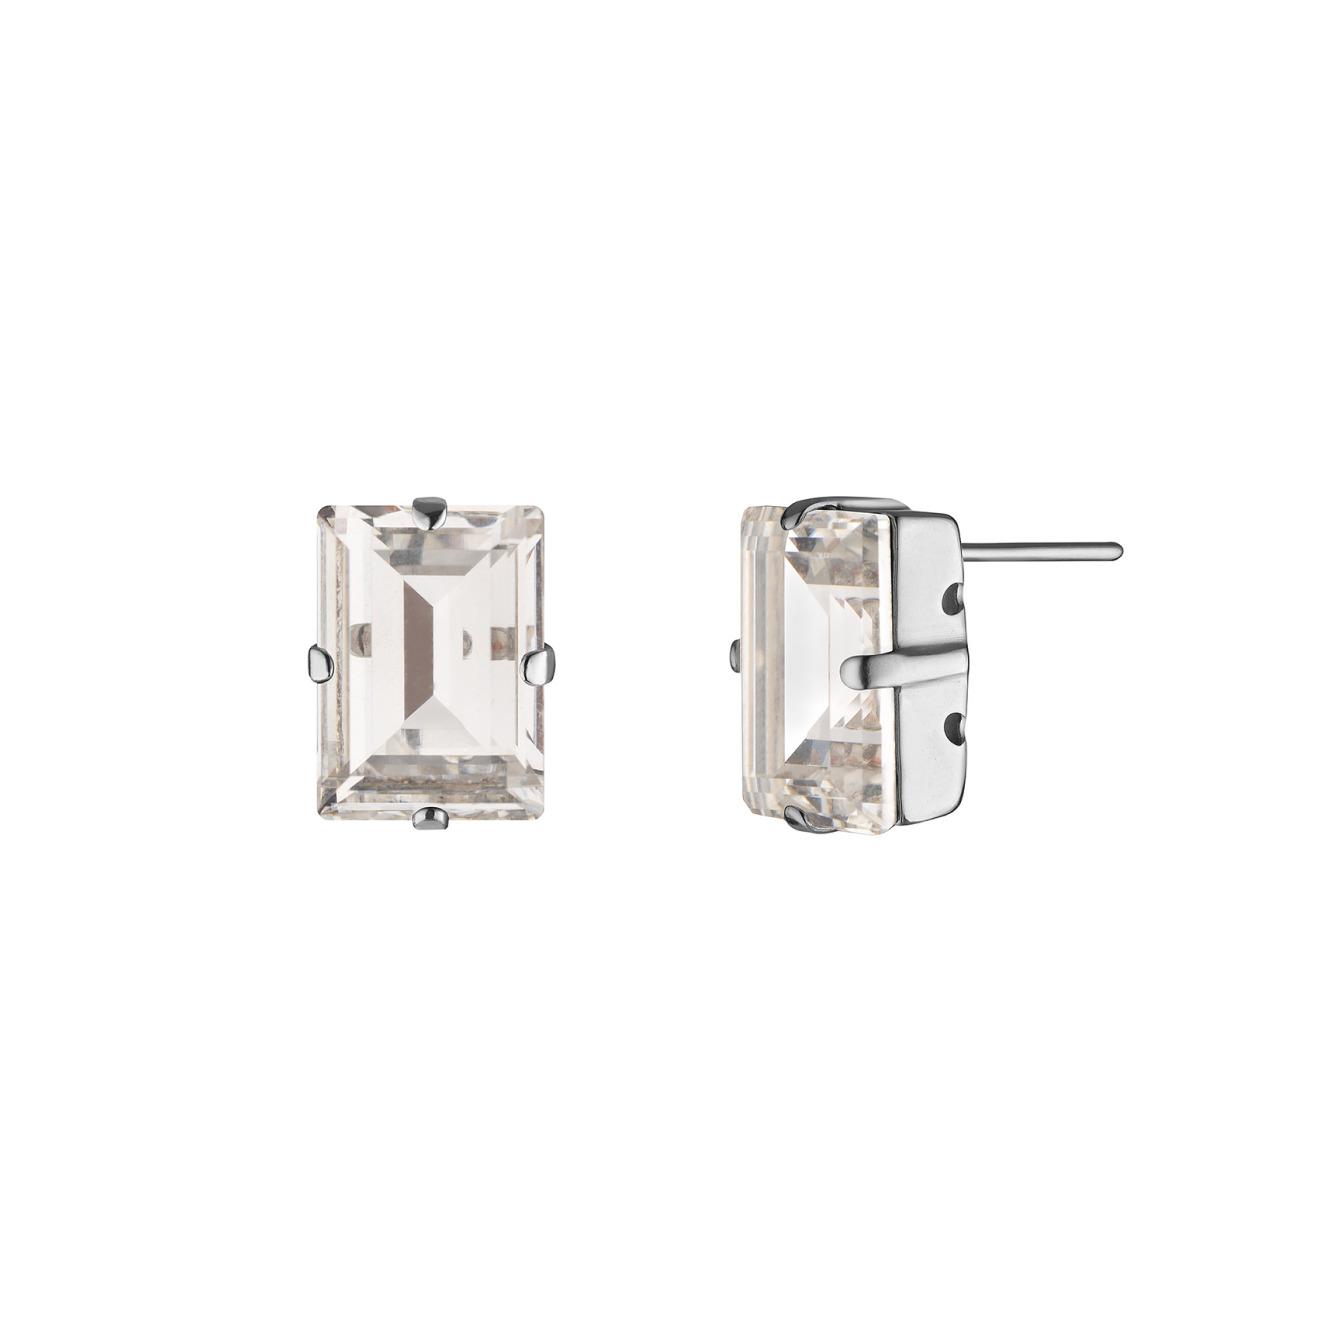 Phenomenal Studio Серебристые серьги с кристаллами Swarovski Step Cut Crystal